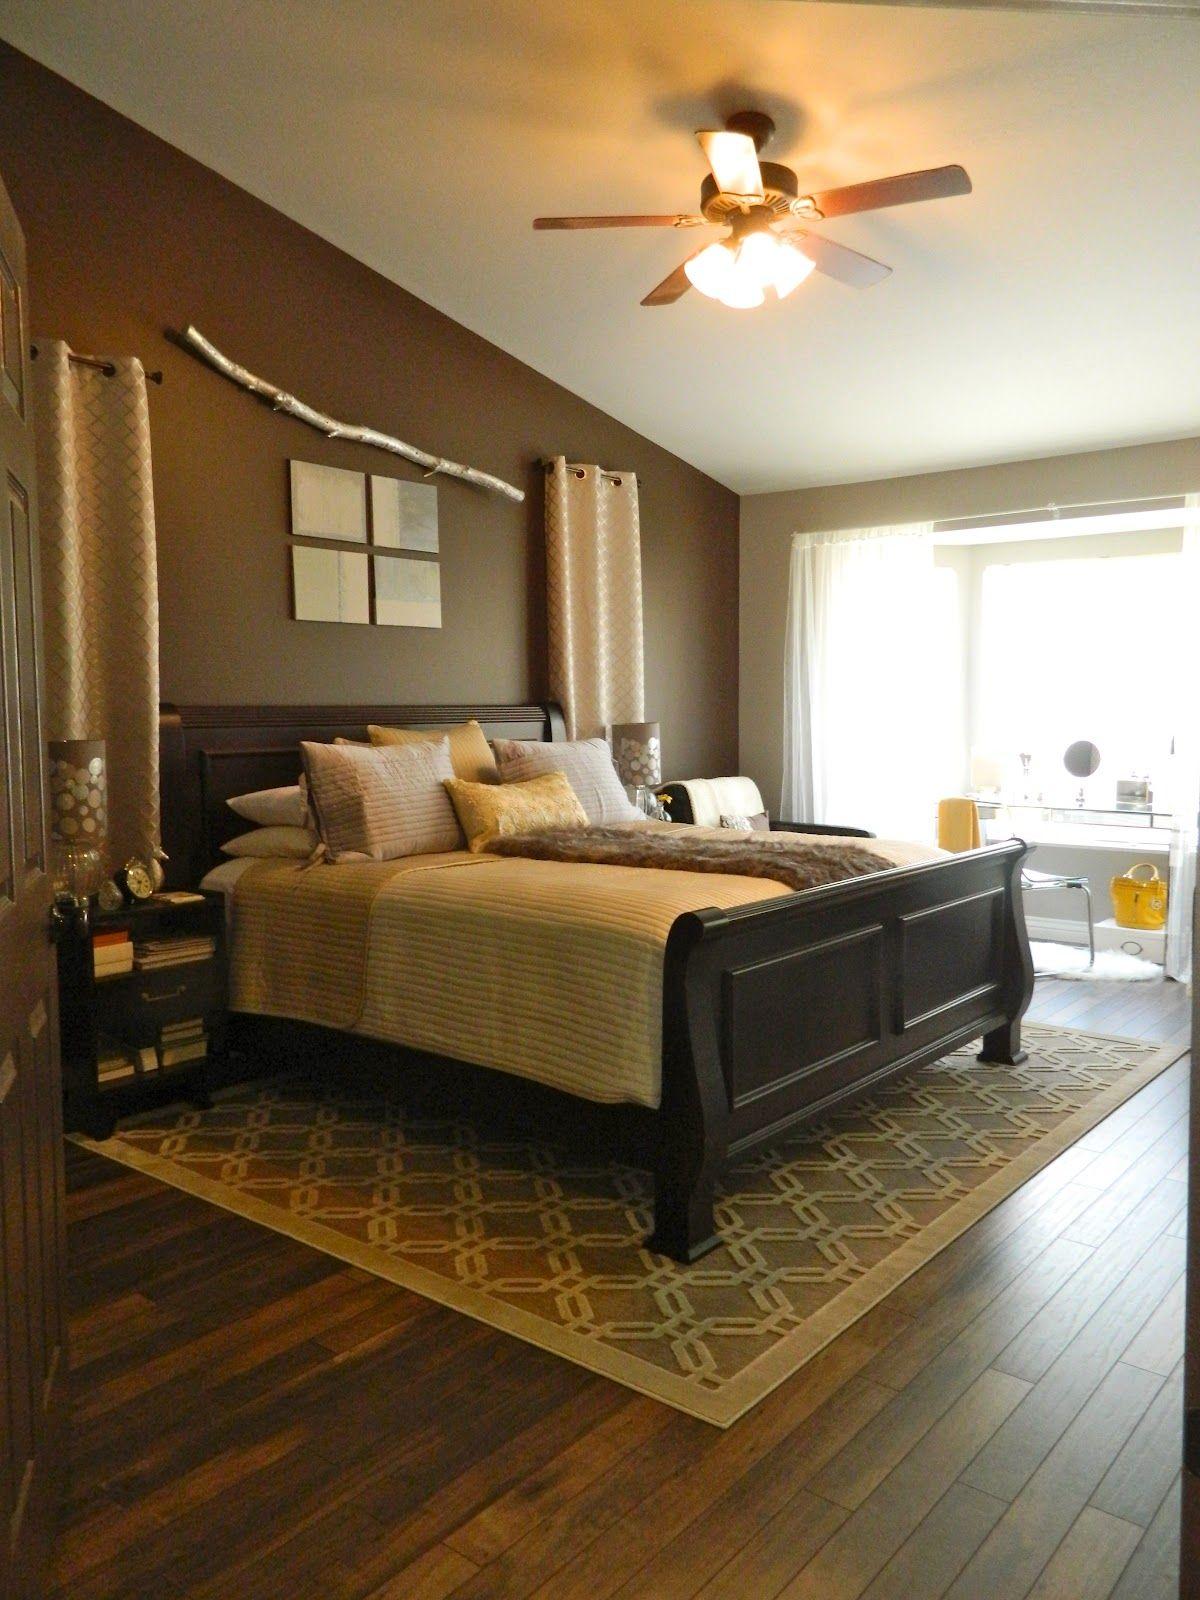 hardwood floors in the master bedroom// I like the area